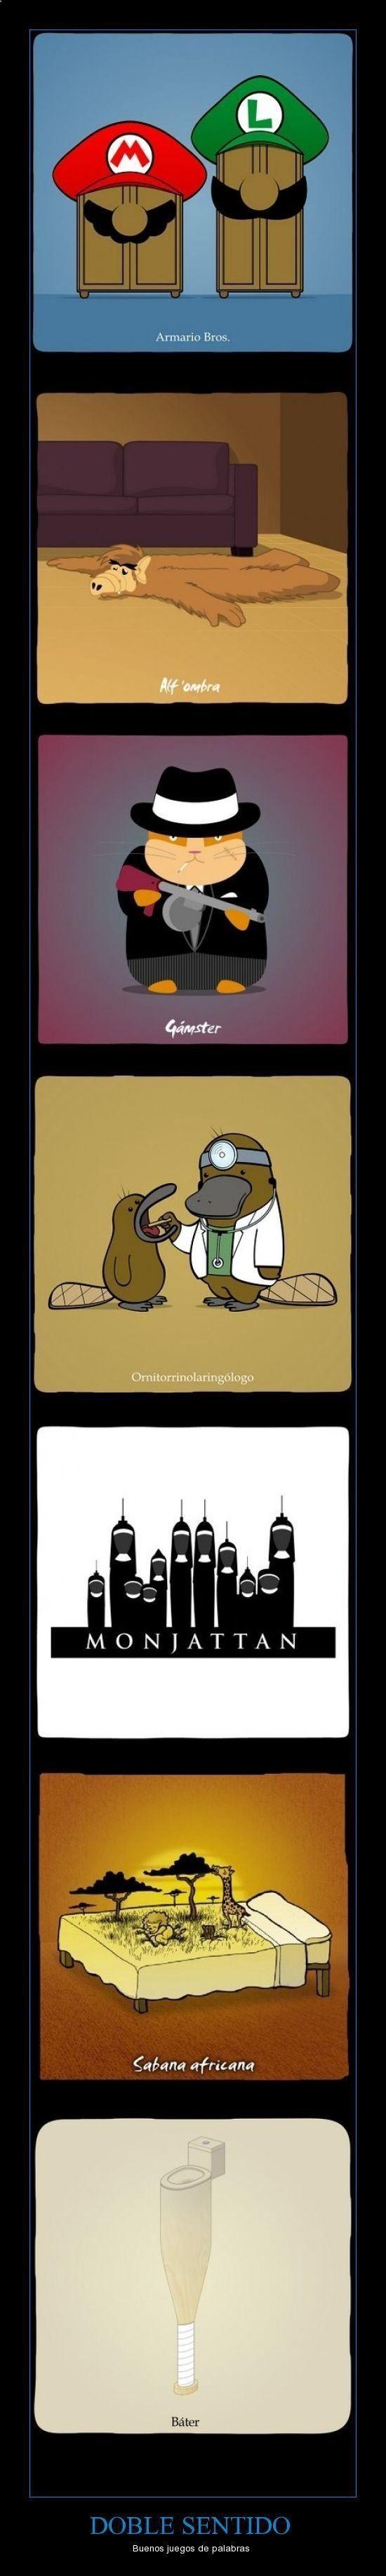 juegos de palabras_doble_sentido ➡➡➡ http://www.diverint.com/gifs-graciosos-whatsapp-explota